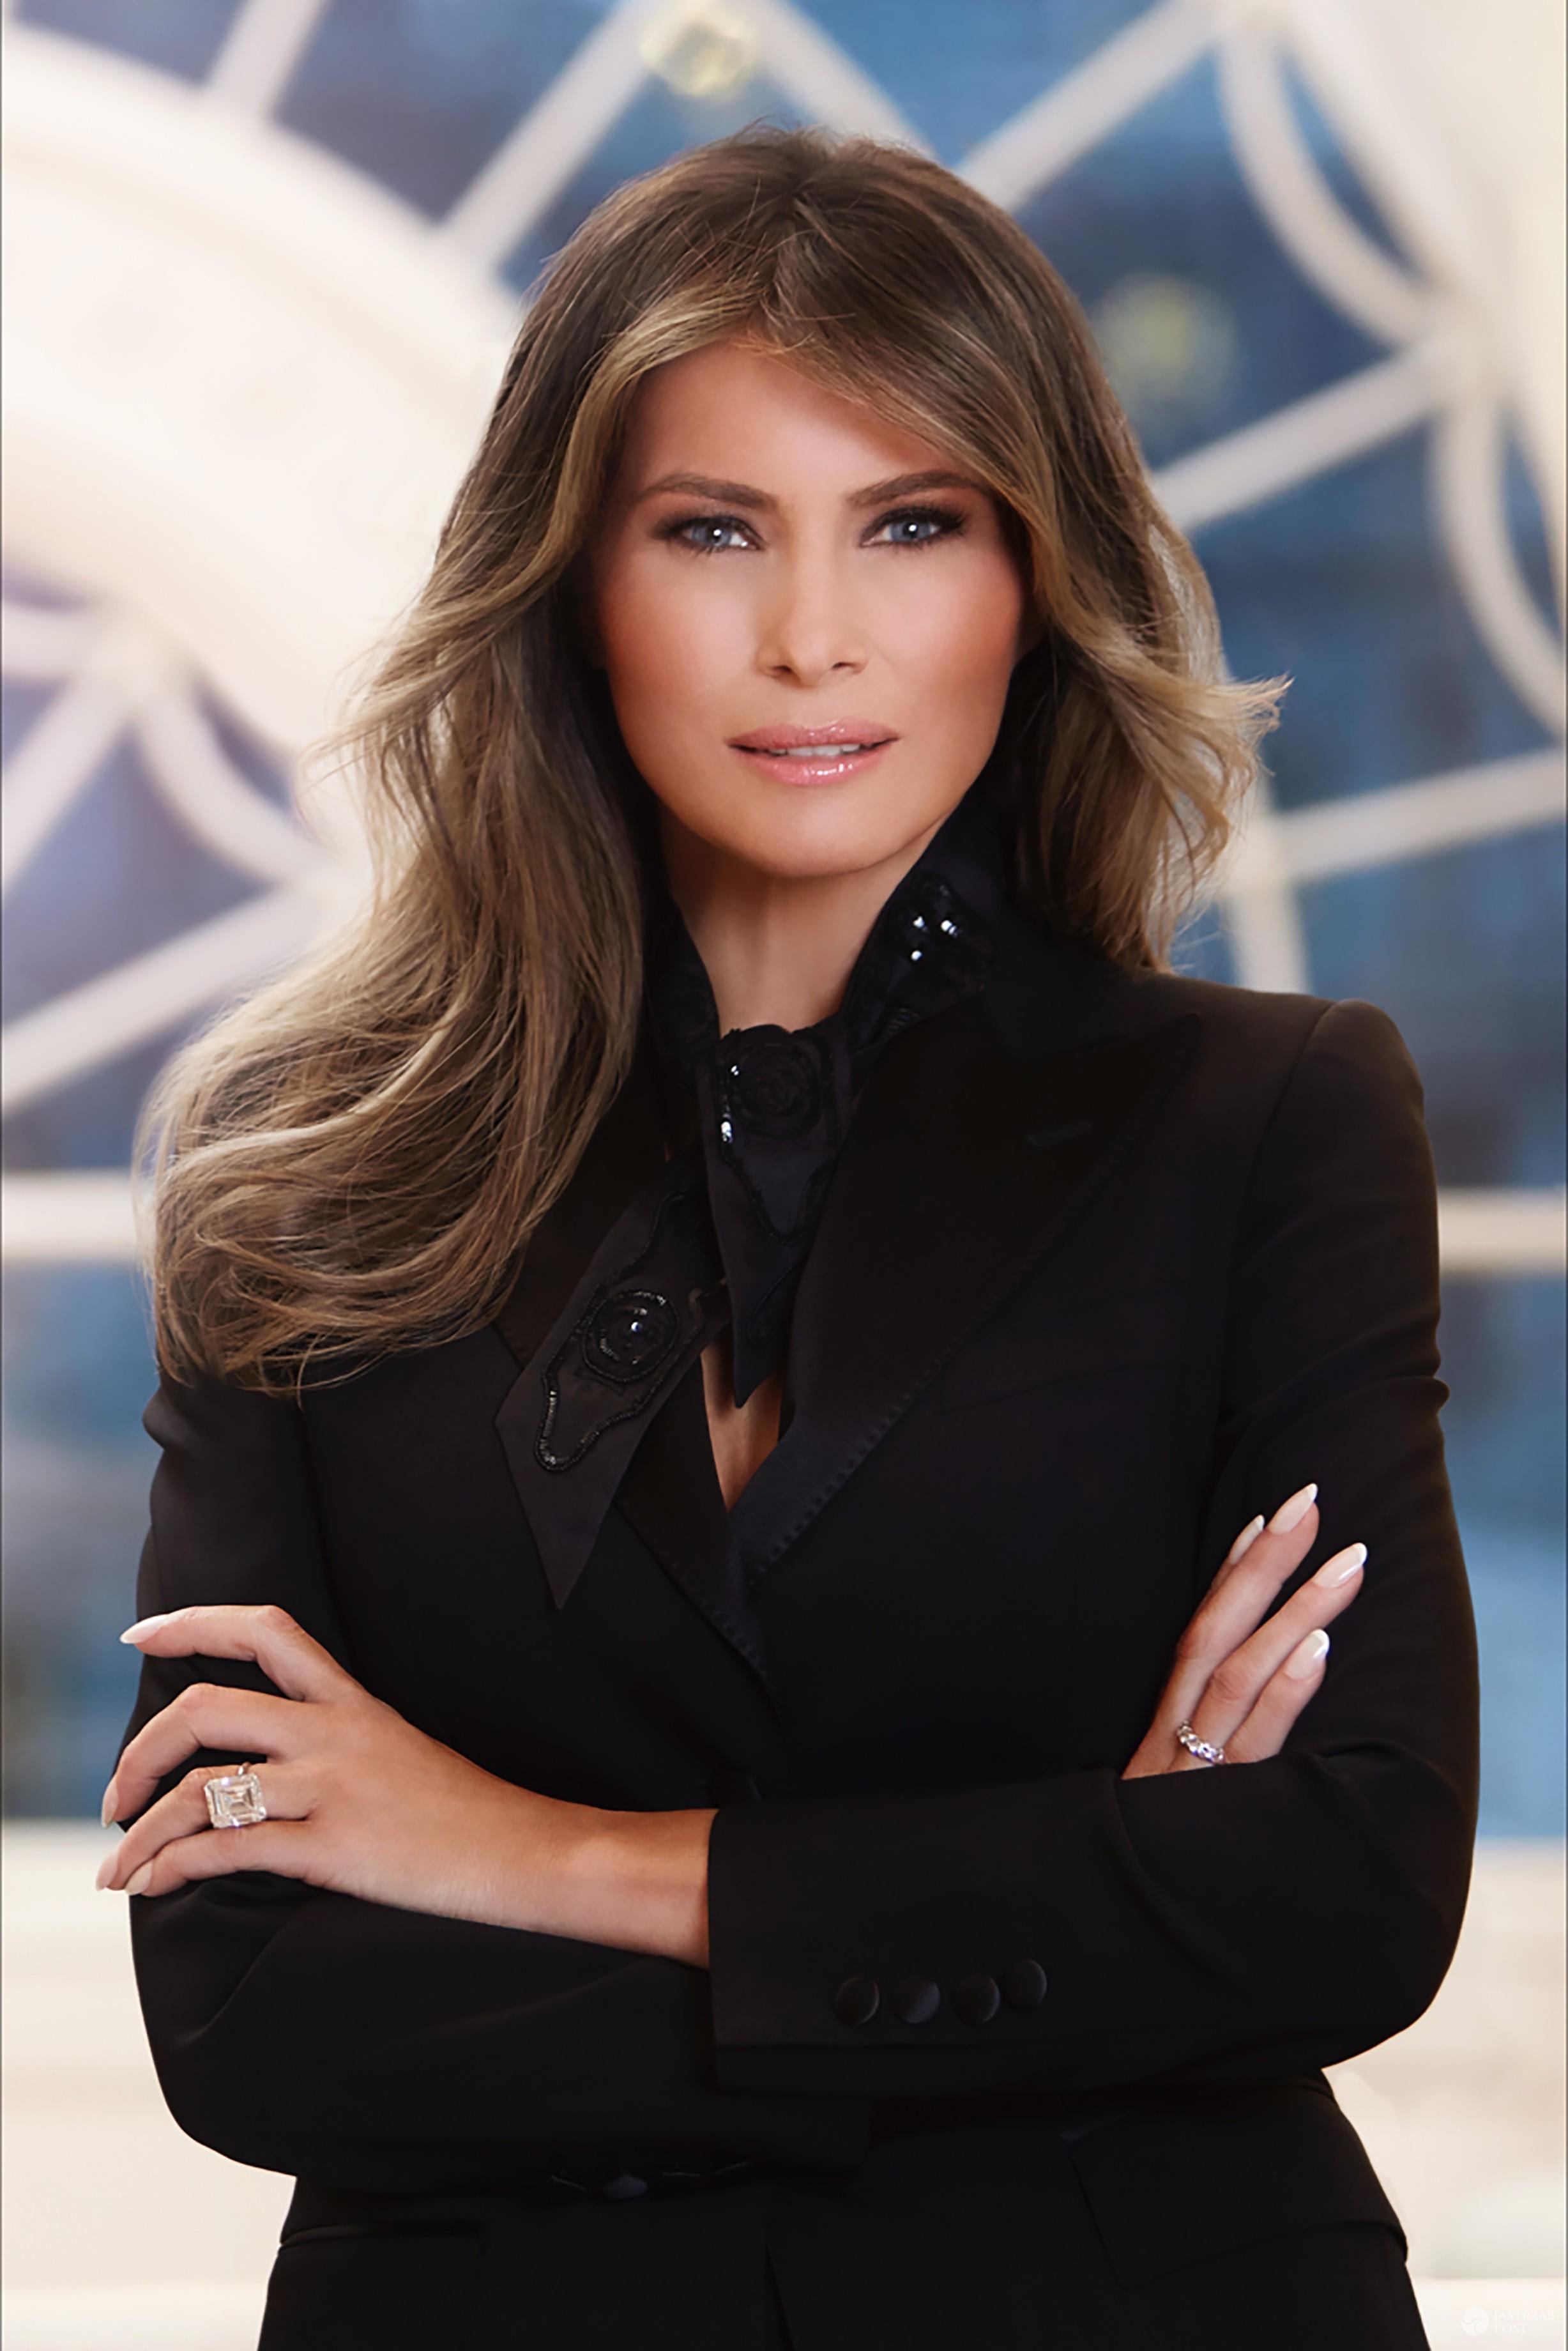 Oficjalny portret Melanii Trump